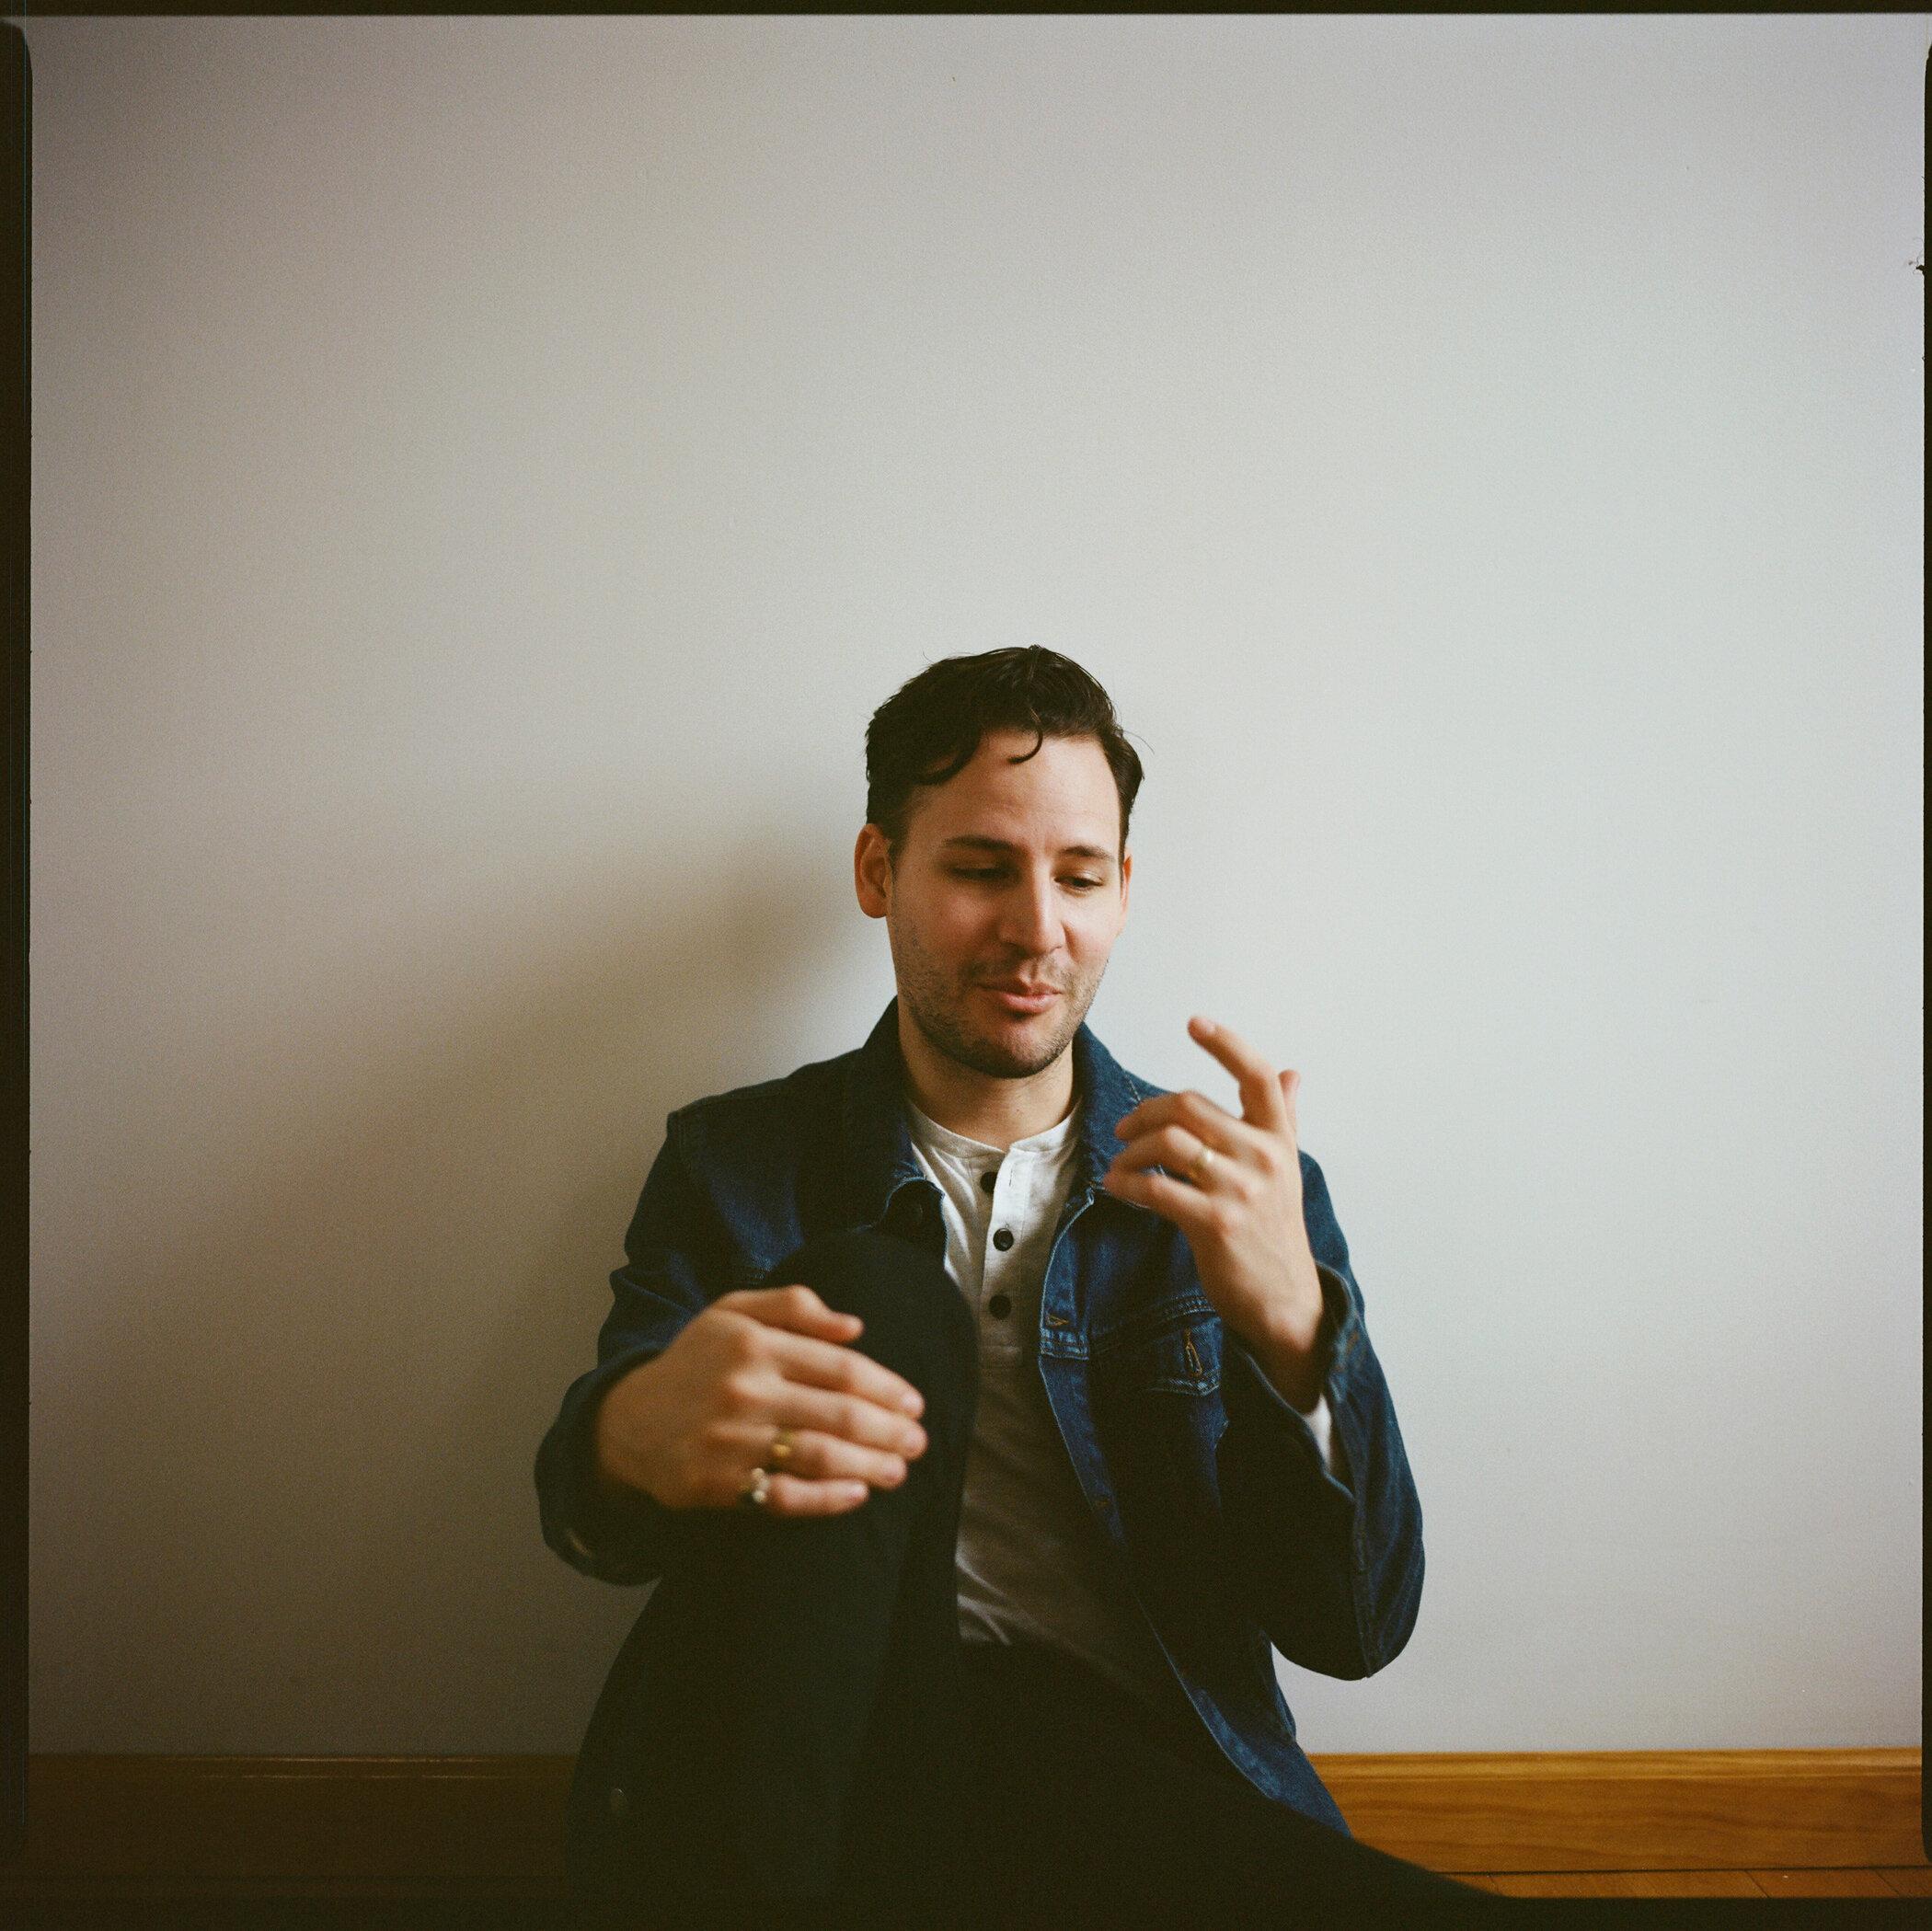 258-aaron-durall-nyc-editorial-portrait-photographer.jpg